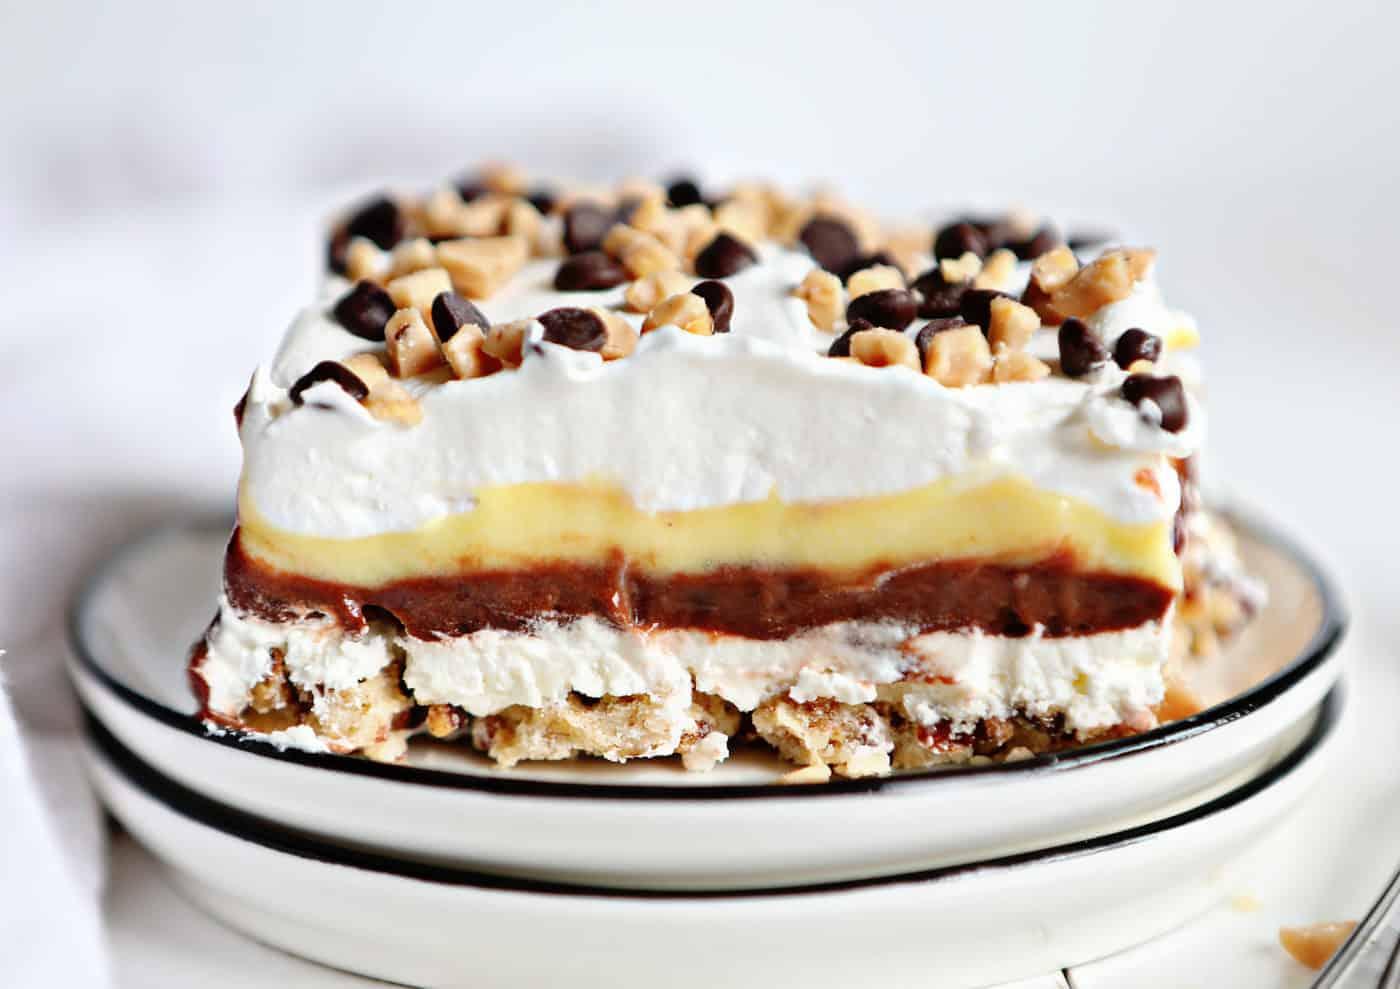 Piggy Pie Dessert